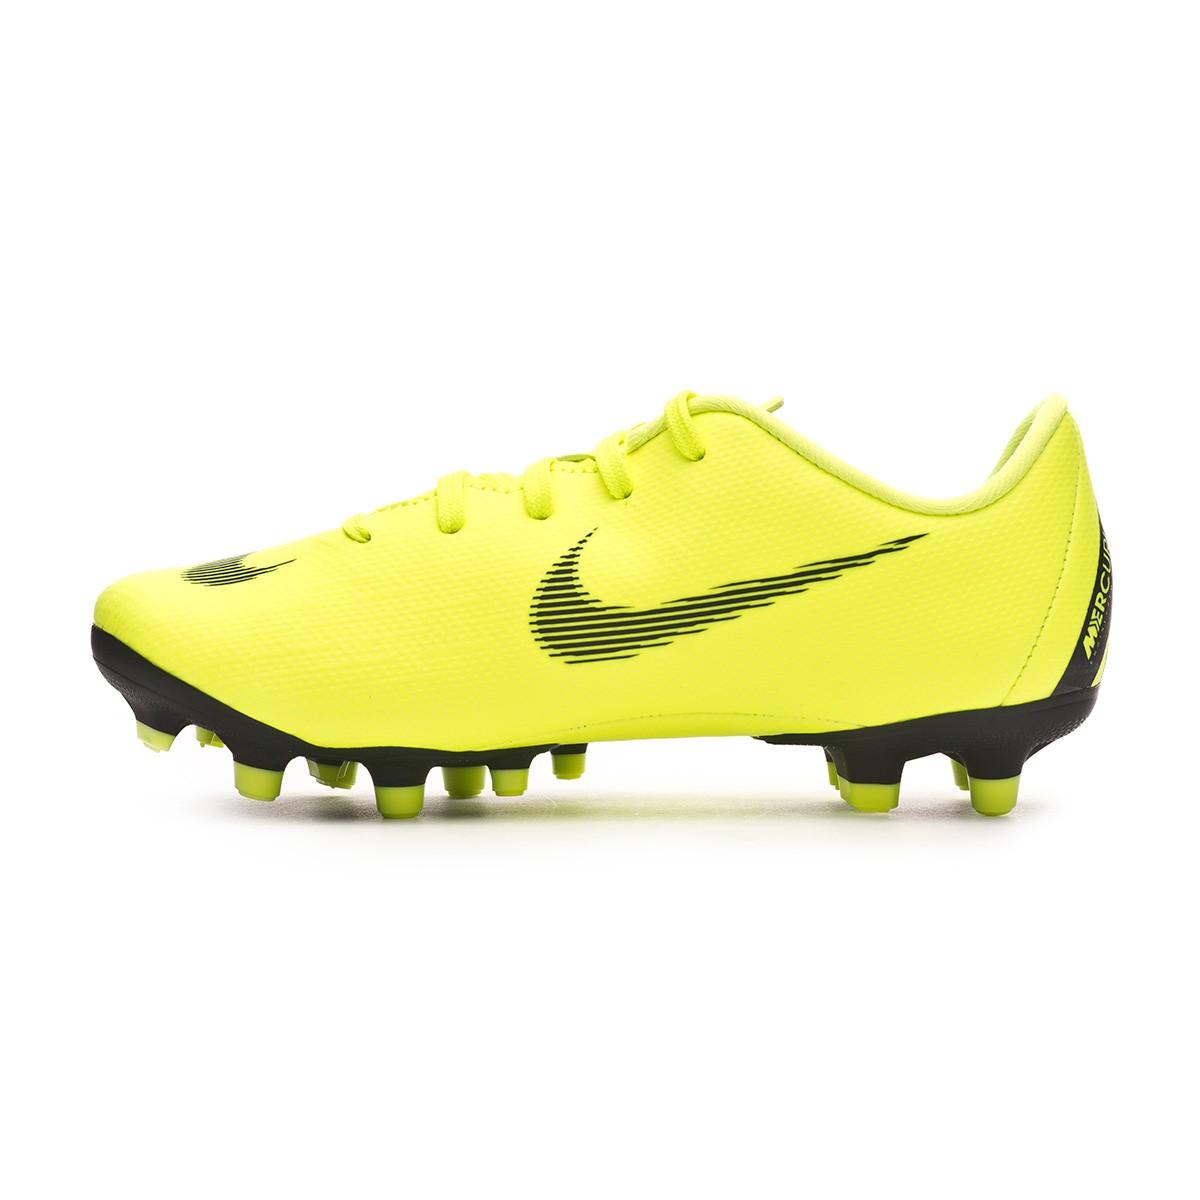 db8724588 Football Boots Nike Kids Mercurial Vapor XII Academy MG Volt-Black - Tienda  de fútbol Fútbol Emotion